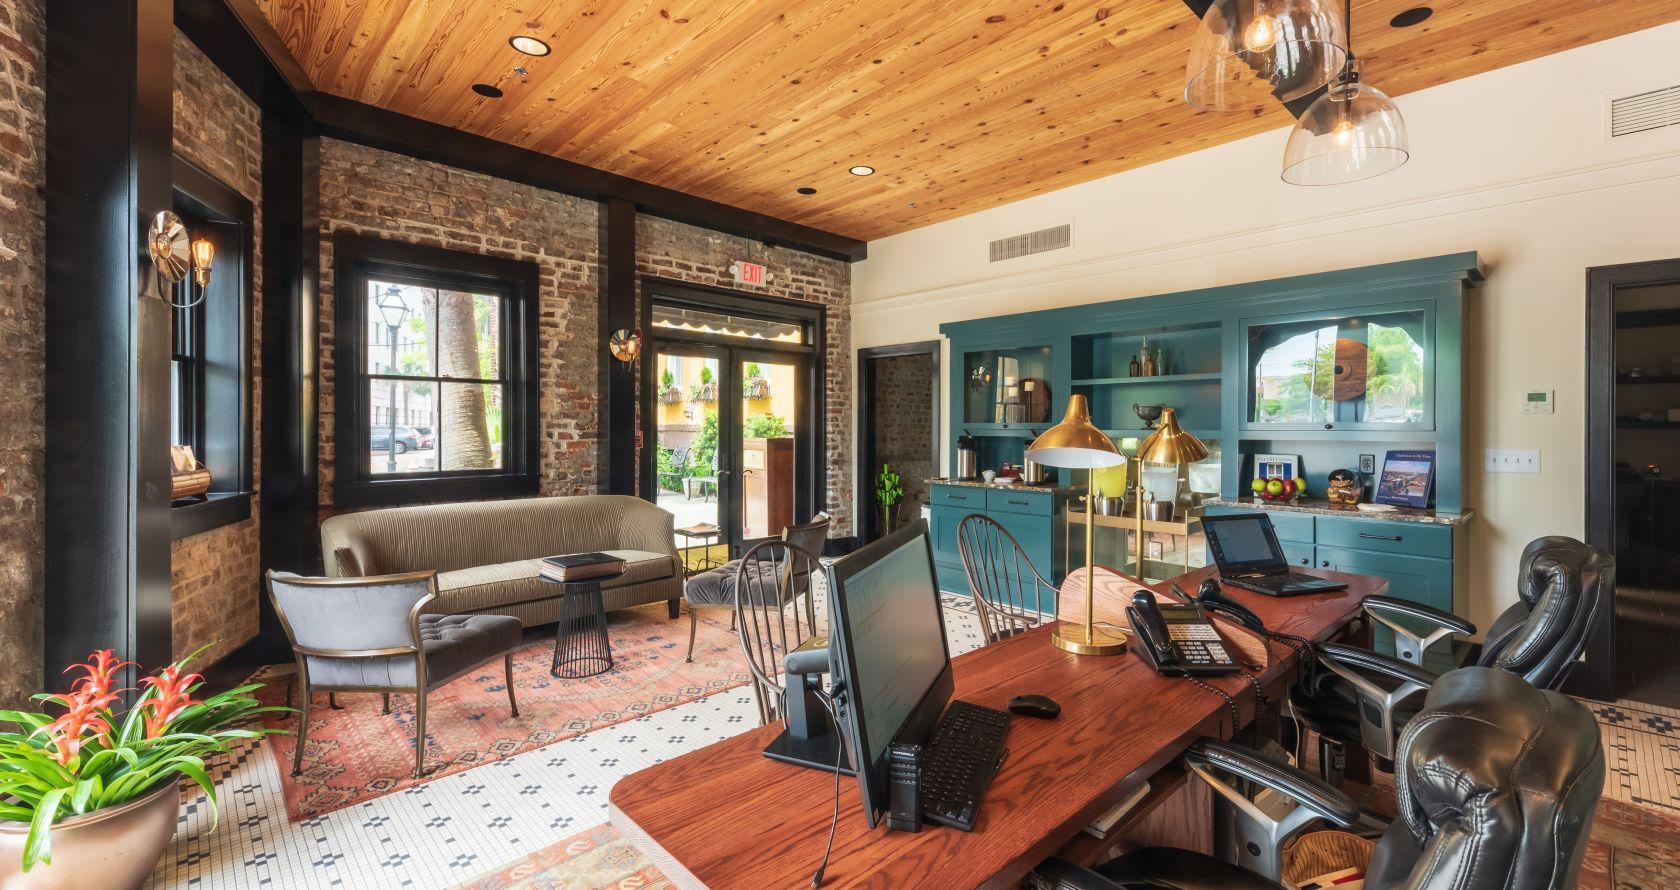 charleston hotel deals andrew pinckney inn. Black Bedroom Furniture Sets. Home Design Ideas